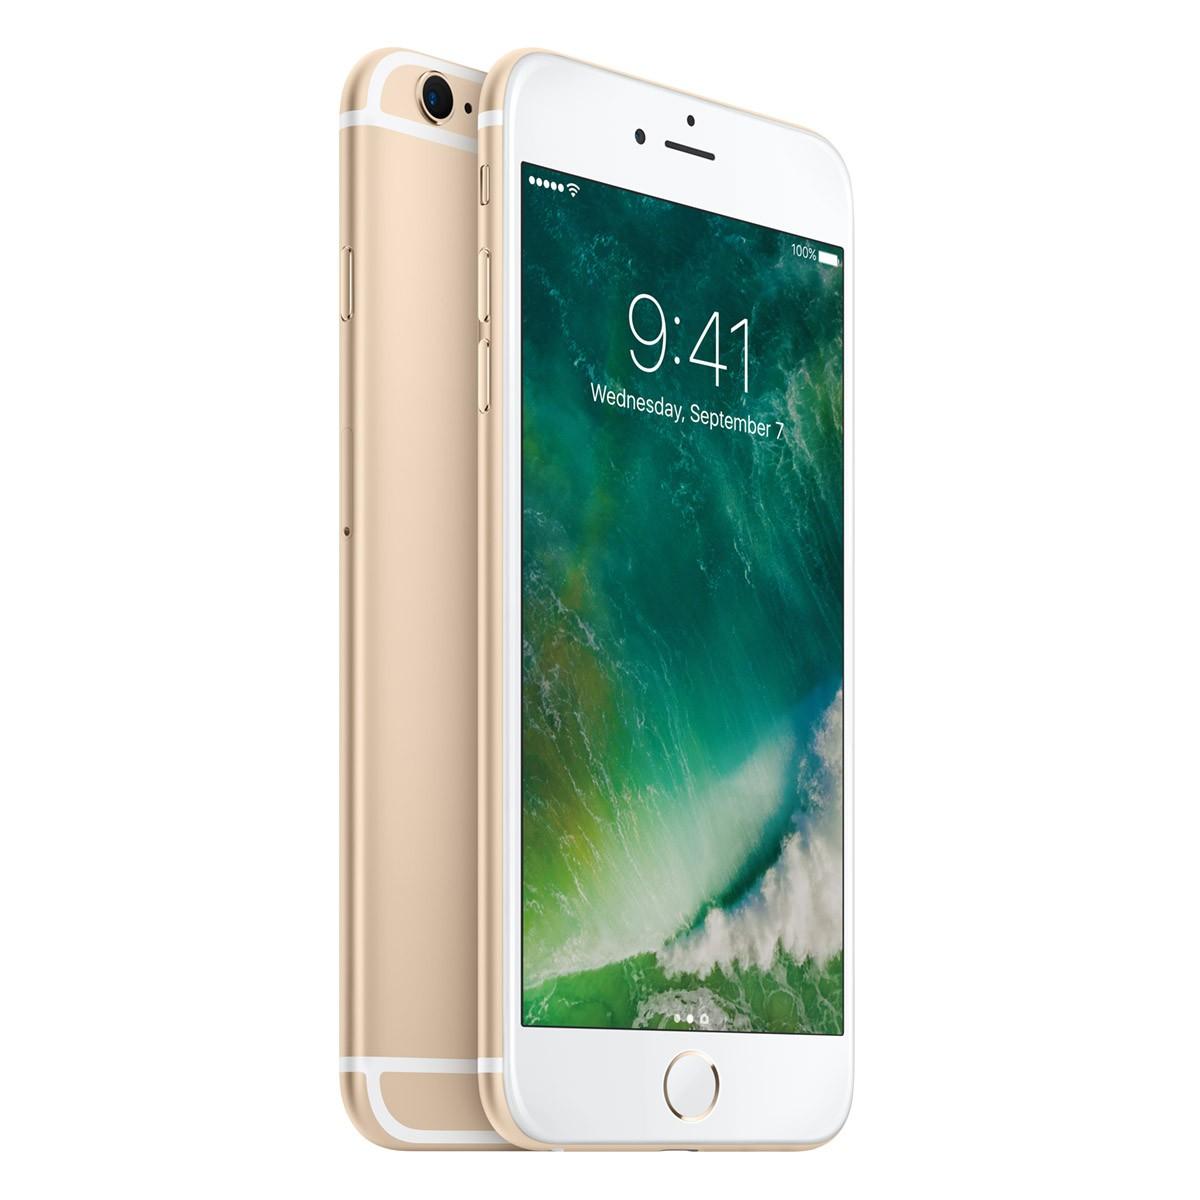 Златист iPhone 6s Plus със 128 GB памет